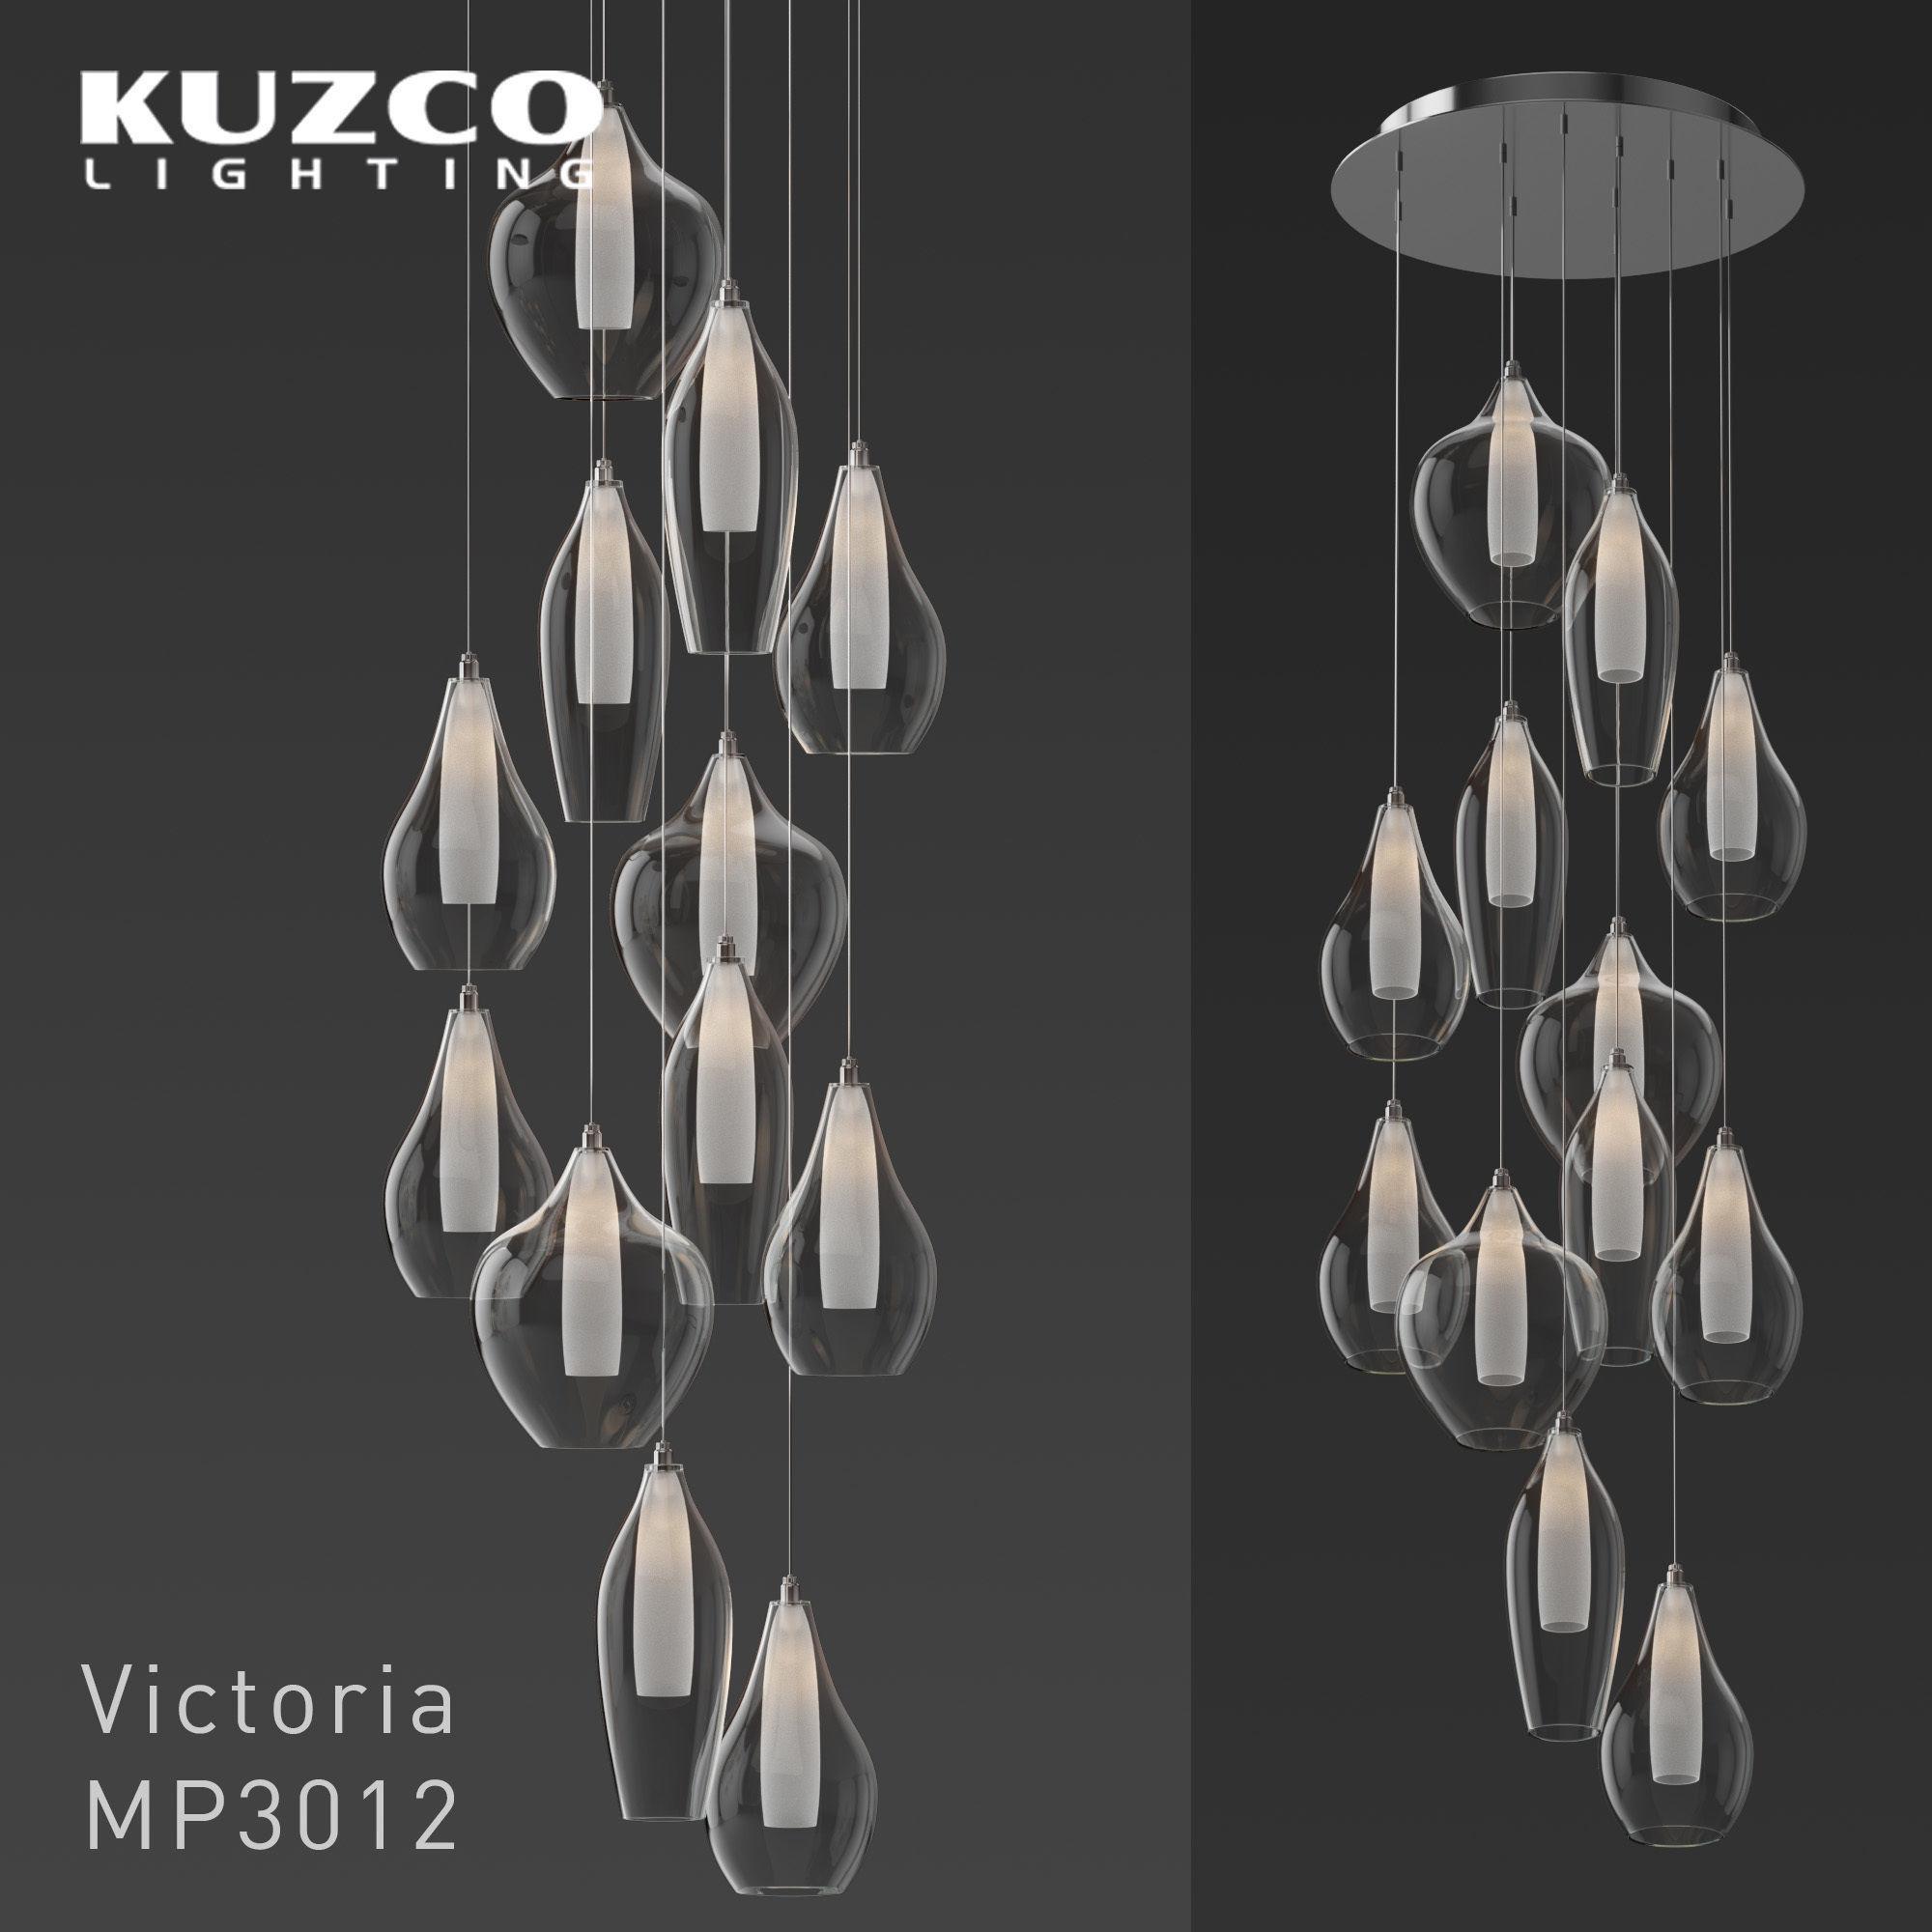 Kuzco Lighting Victoria Mp3012 Pendant Light Model